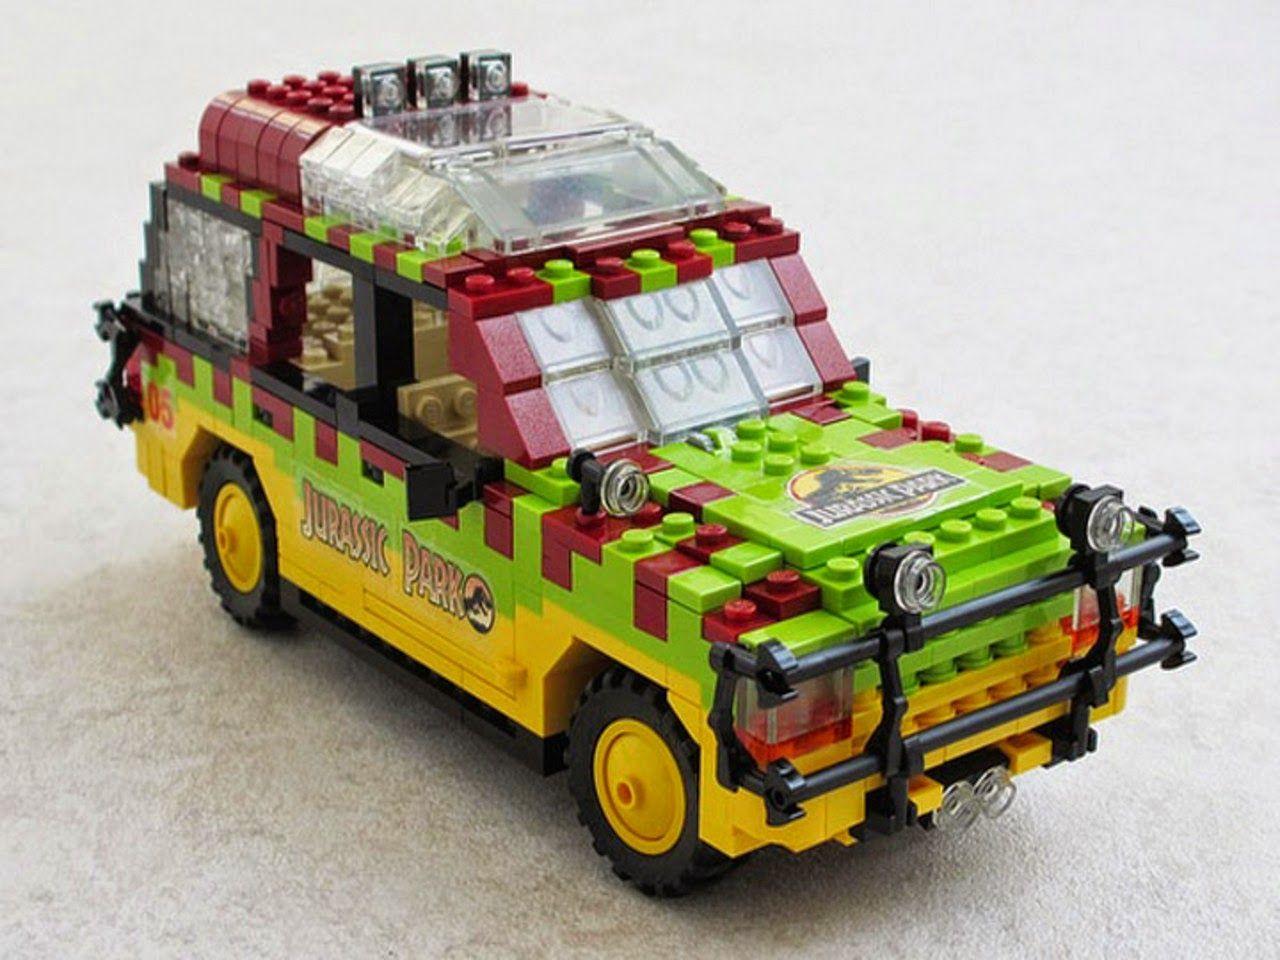 Jurassic Park / Ford Explorer- LEGO | Lego my Lego | Pinterest ...